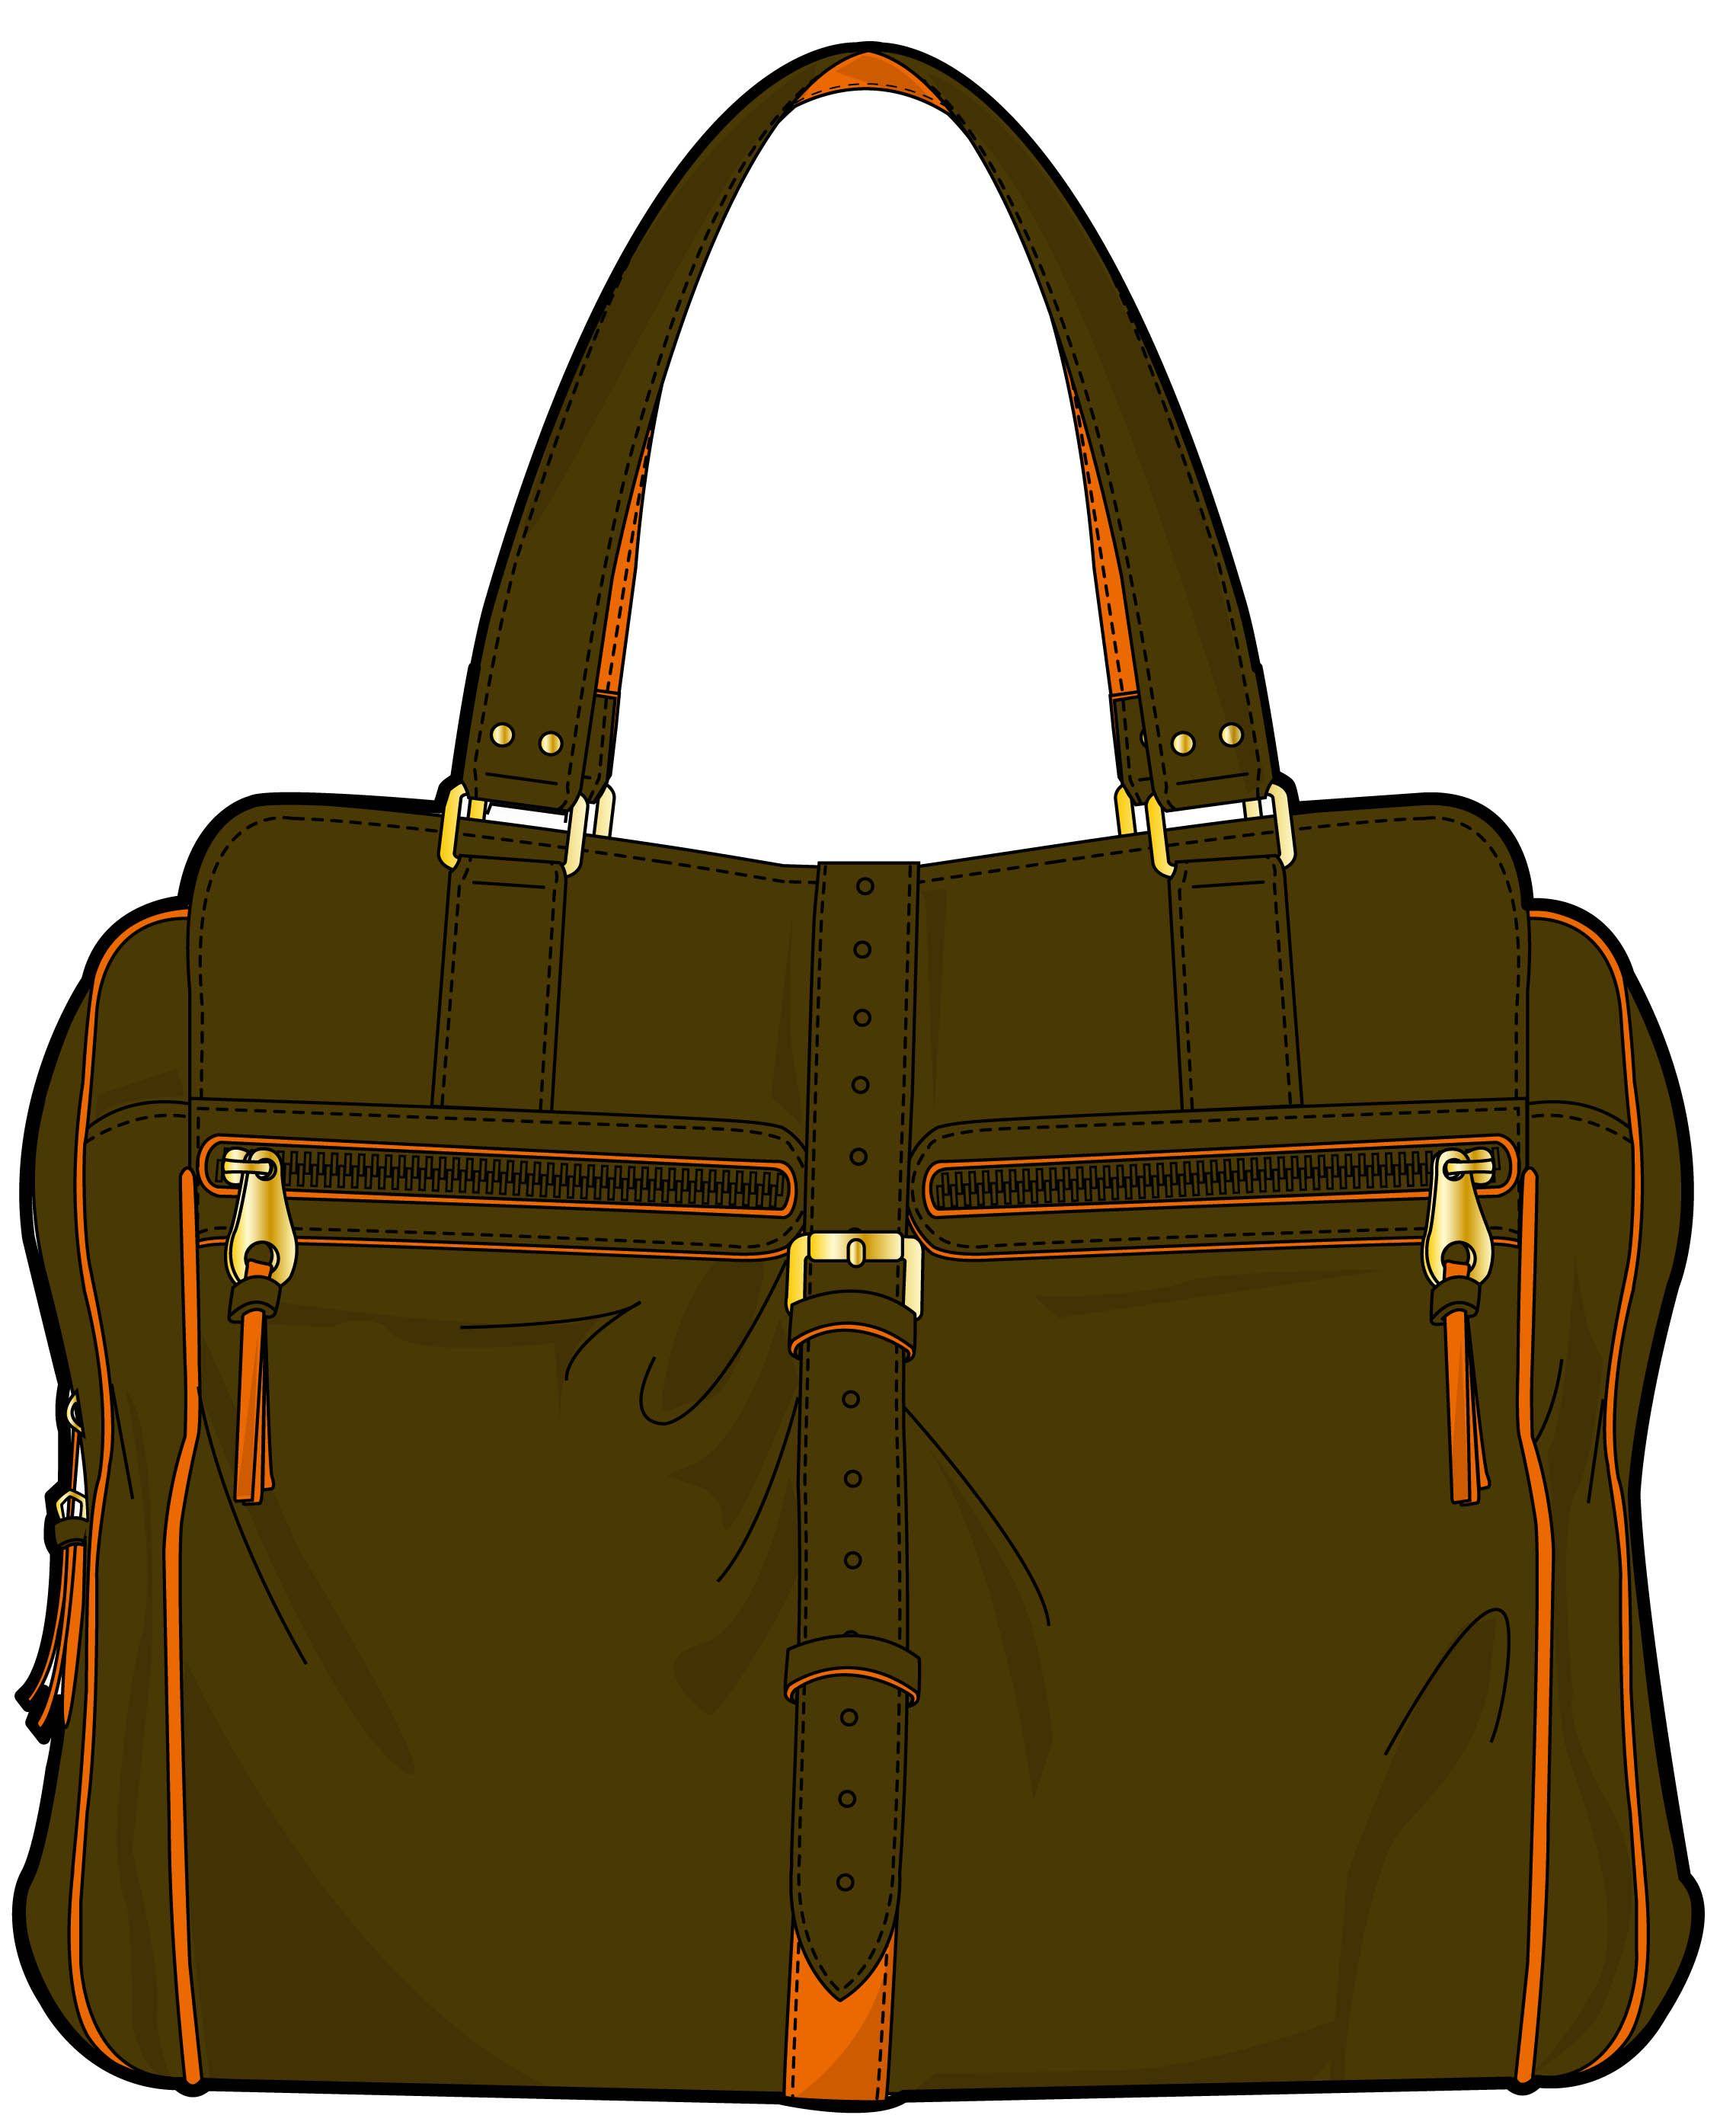 green handbag with orange seam and golden clasp   Bag